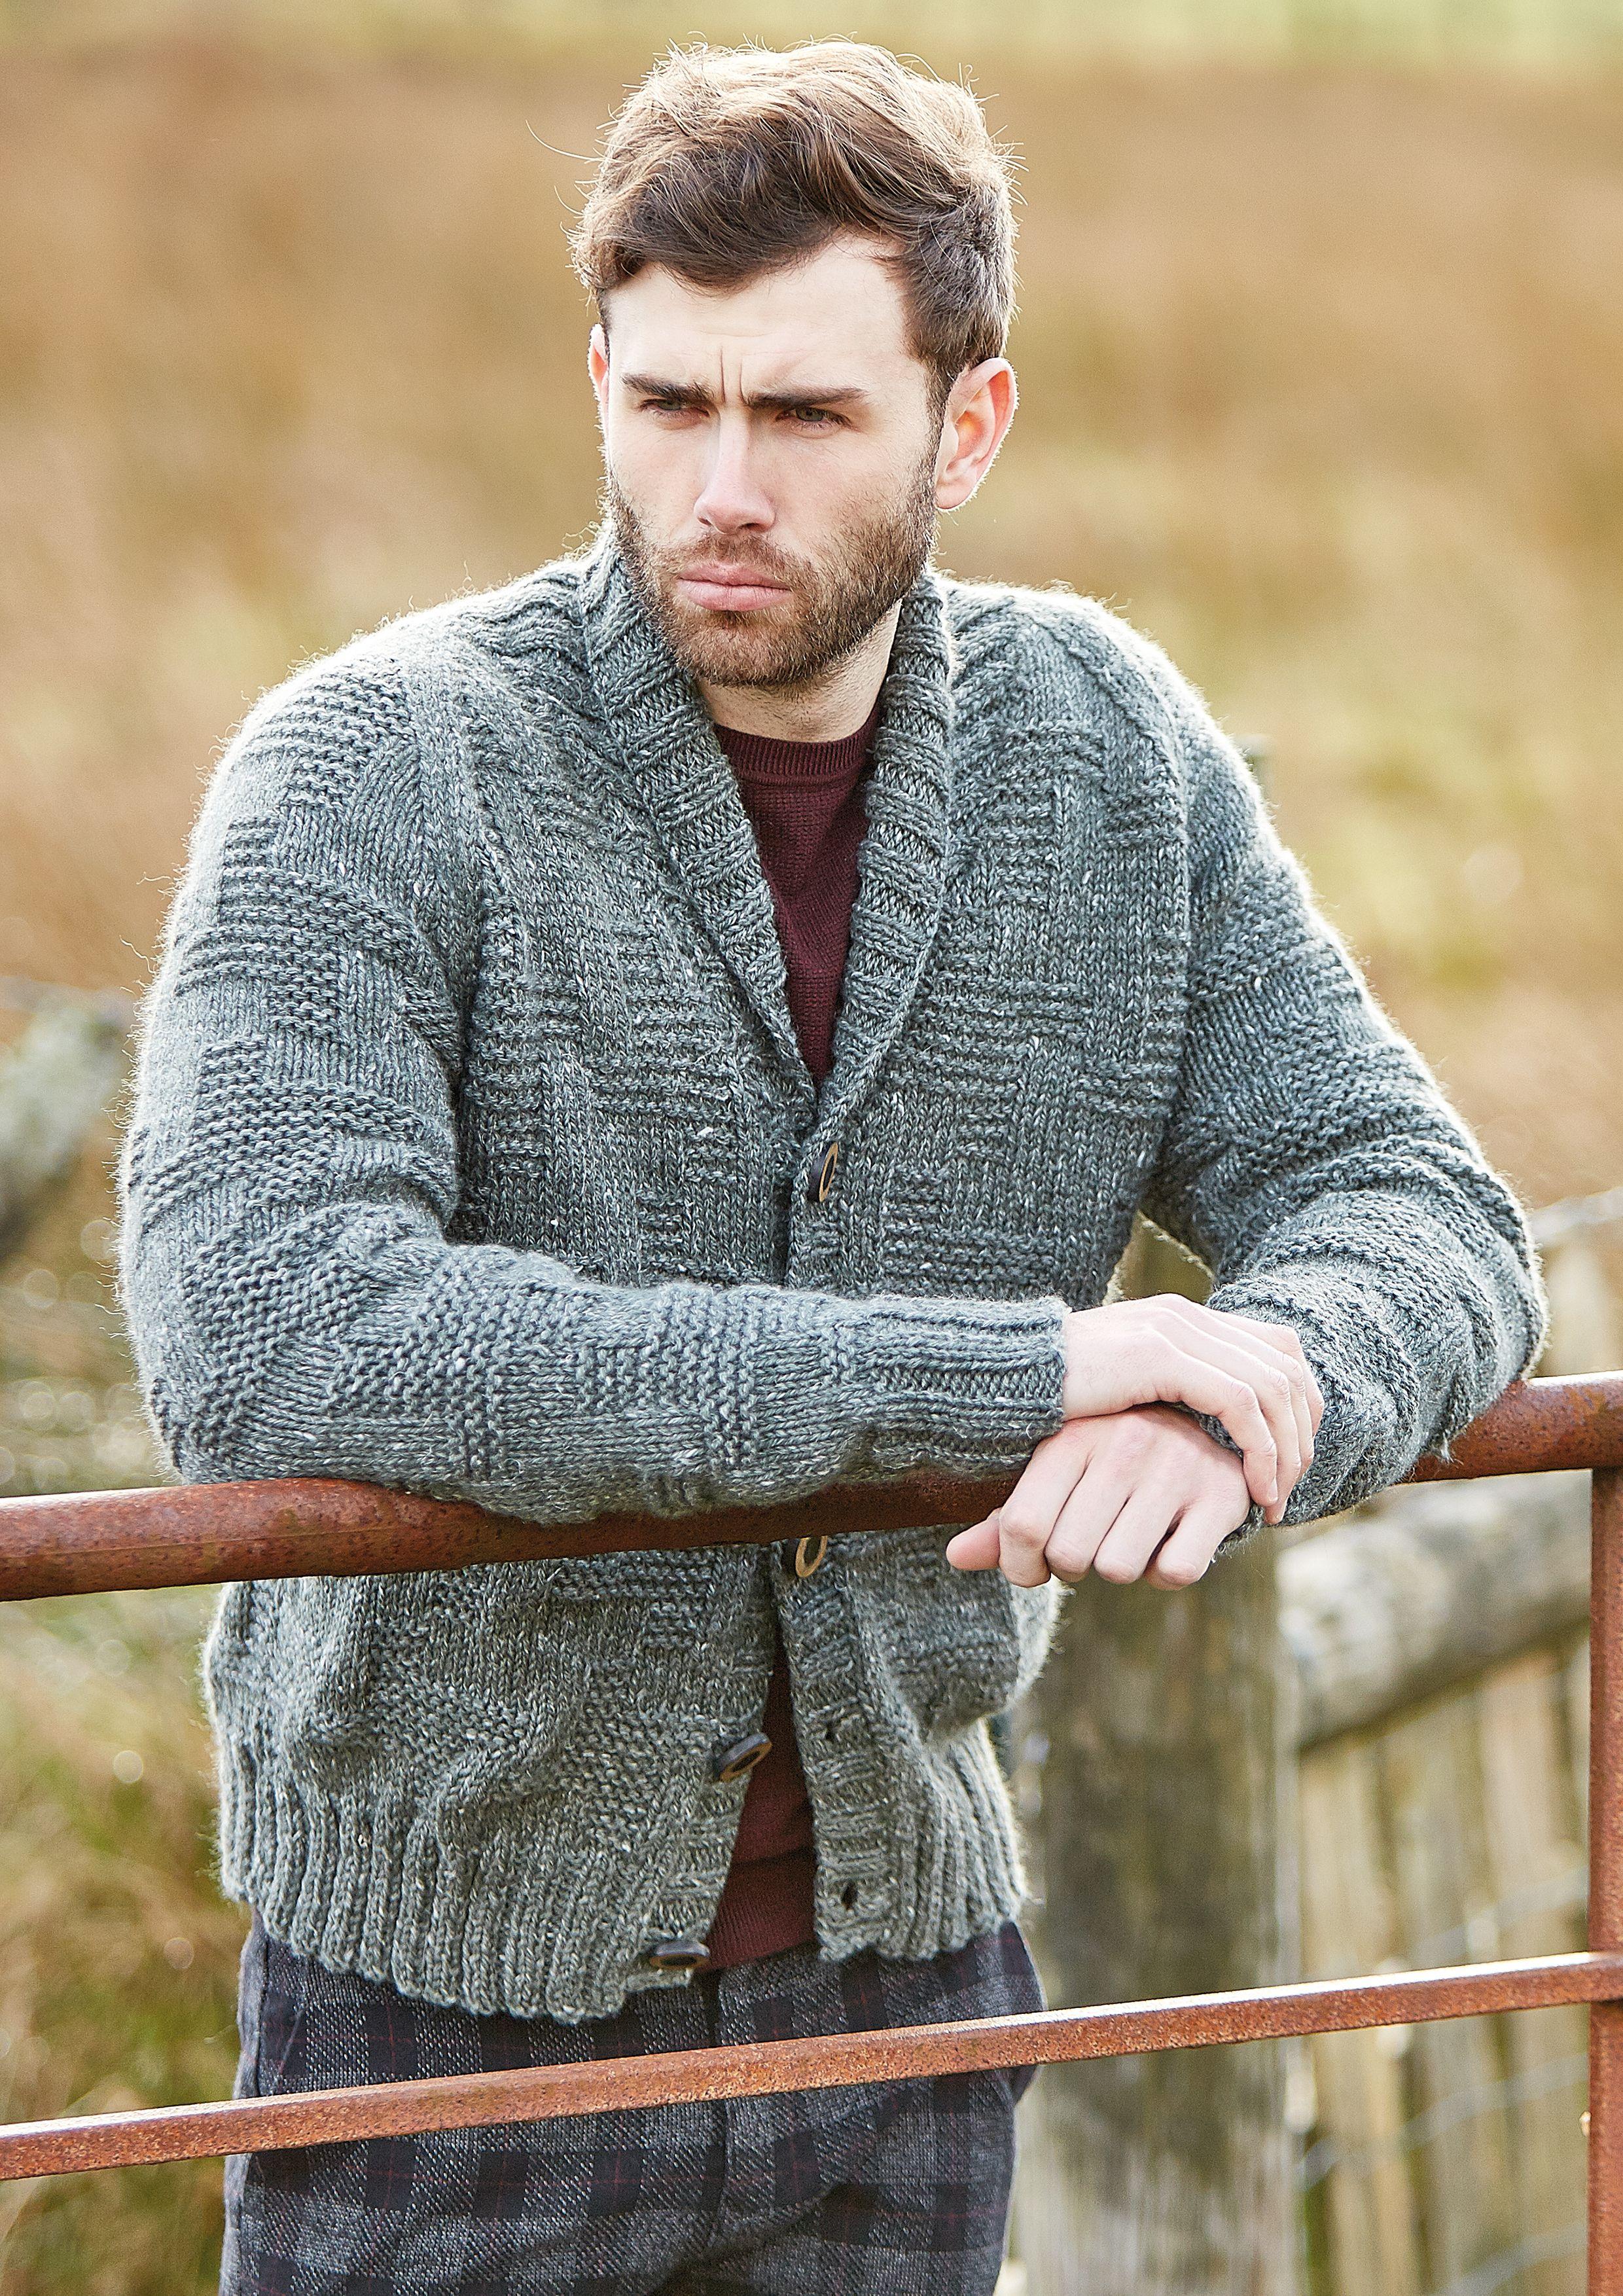 Thorpe | Knitting patterns free sweater, Mens knitted ...